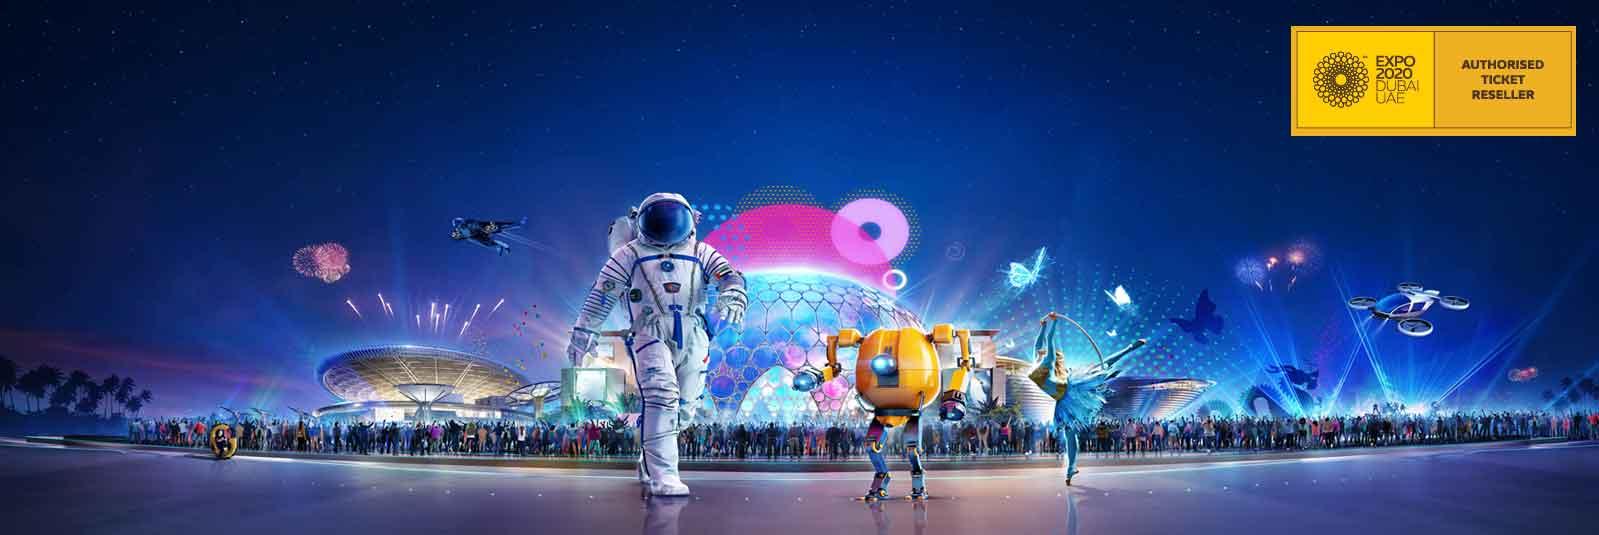 Dubai-Expo-2020-Ticket-Buy-Online